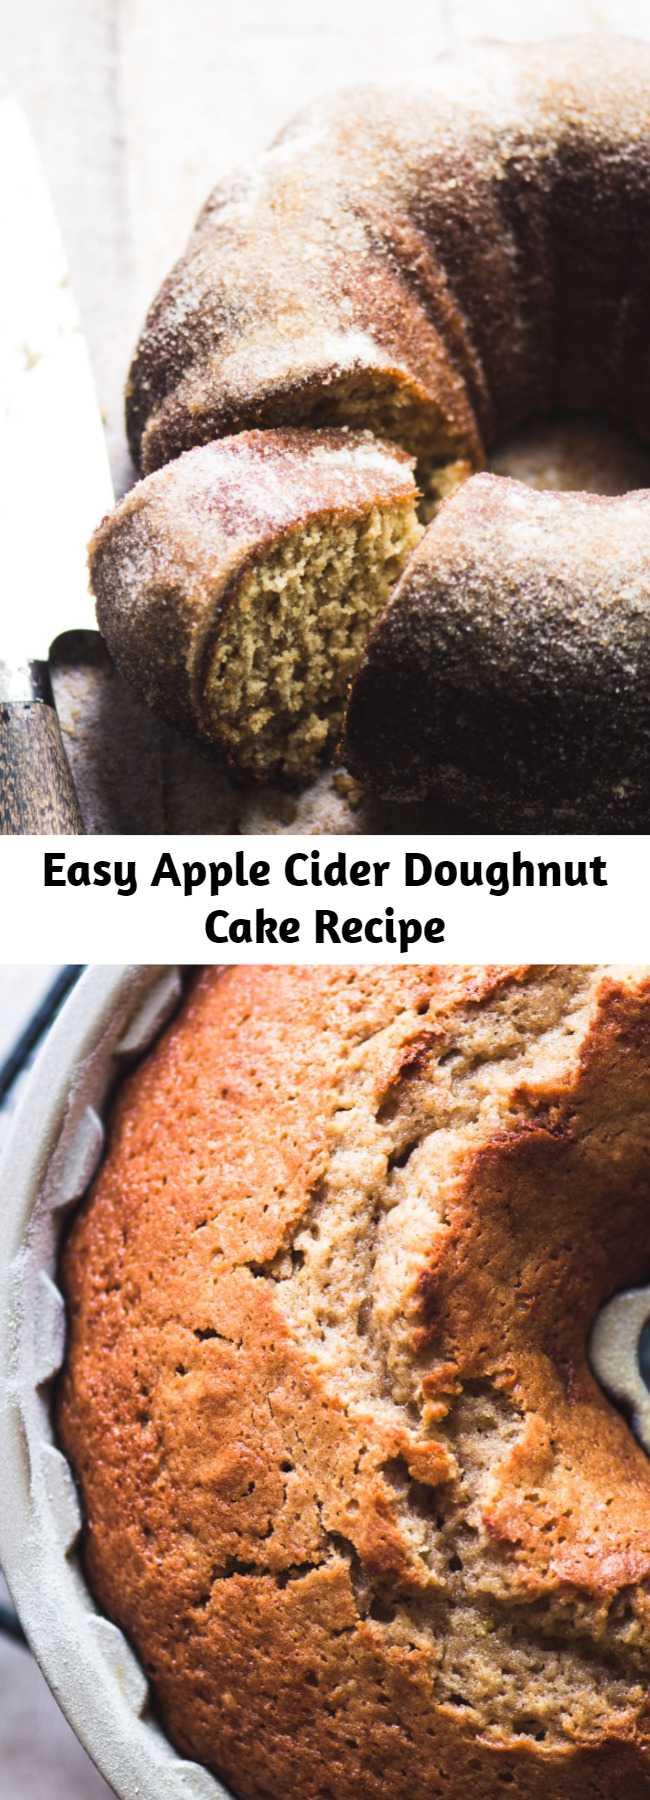 Easy Apple Cider Doughnut Cake Recipe - A warm cinnamon apple cider cake that tastes just like Fall's iconic apple cider doughnuts. It's basically everything you love about the season, baked up in a bundt pan. #easy #recipe #cake #ciderdoughnuts #poundcake #bundtcake #applecake #best #dessert #fallrecipe #fall #apples #bundt #coffeecake #brunch